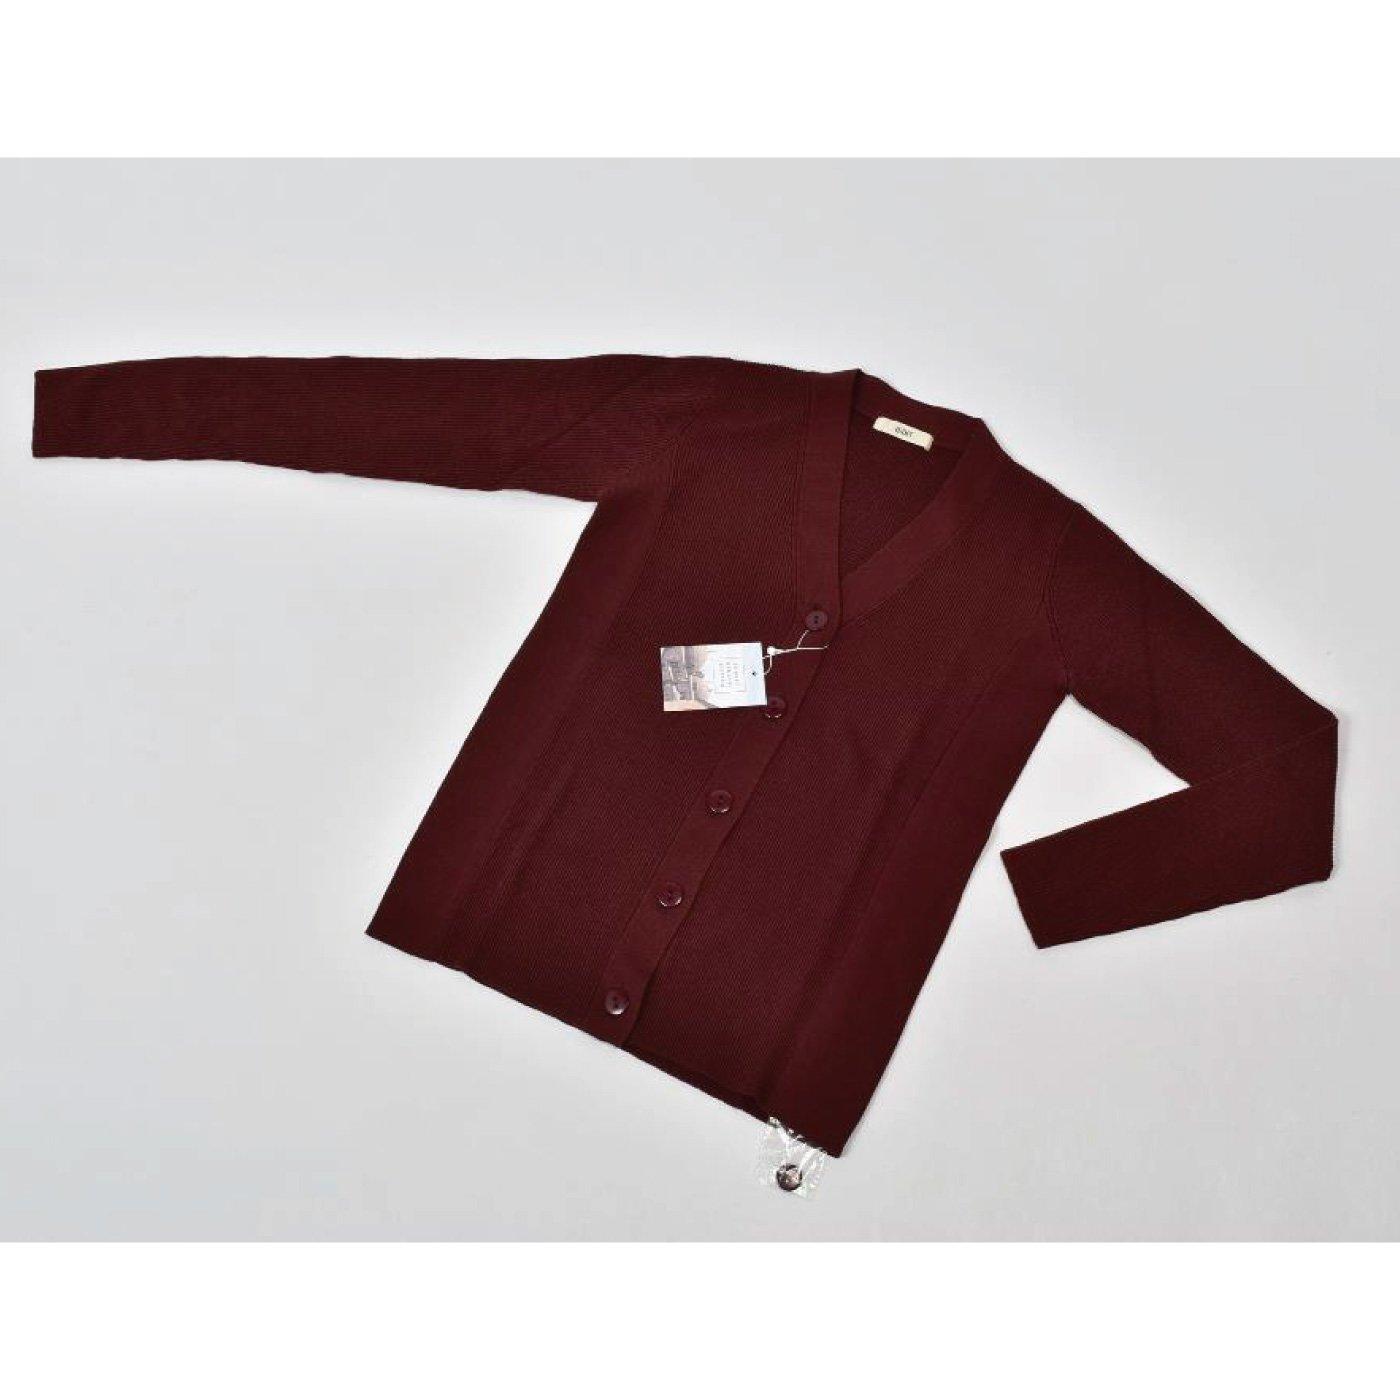 IEDIT[イディット] トルコオーガニックコットン Vネックニットカーディガン〈ブラウン〉